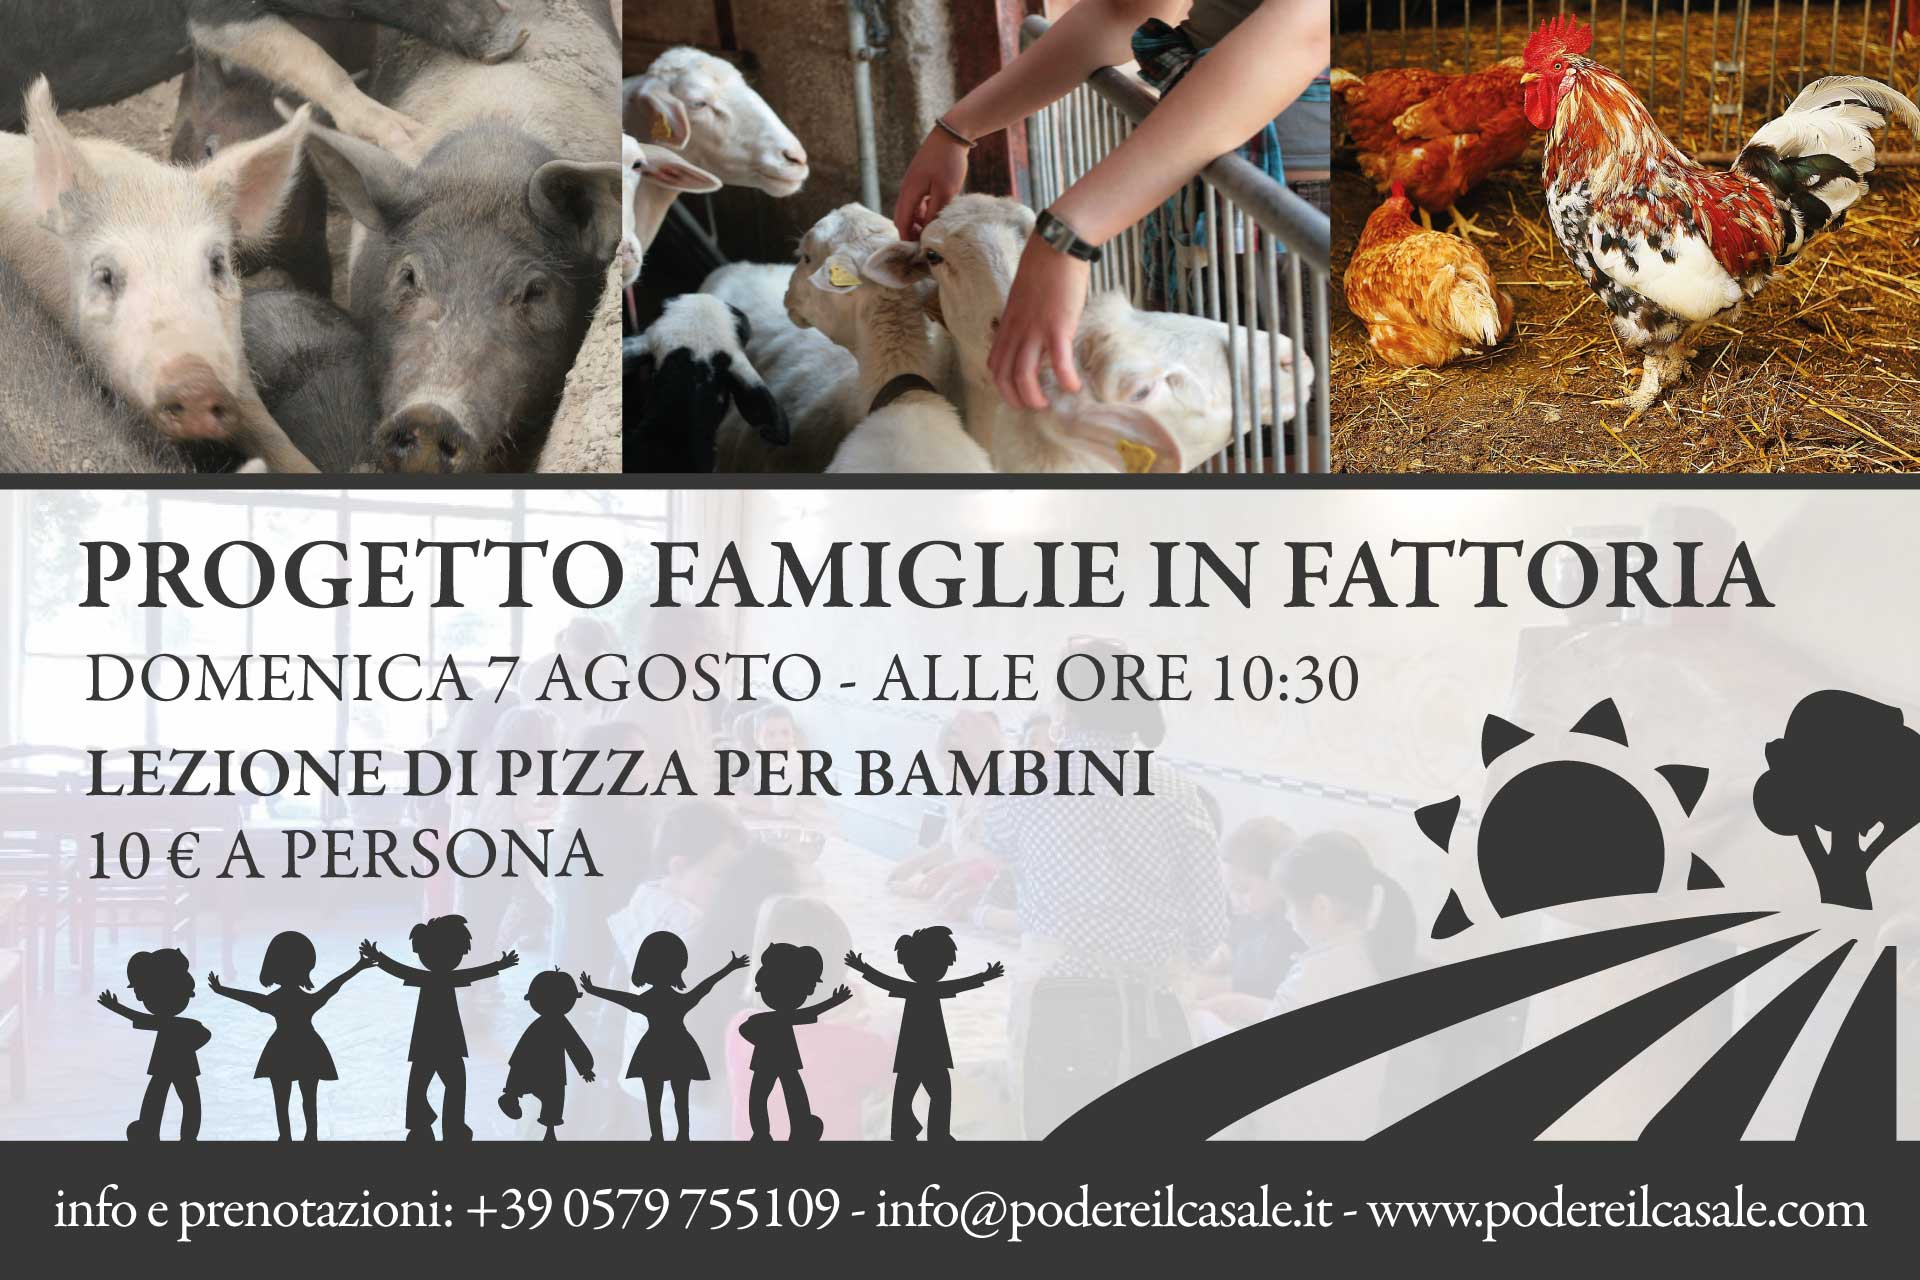 Famiglie in Fattoria